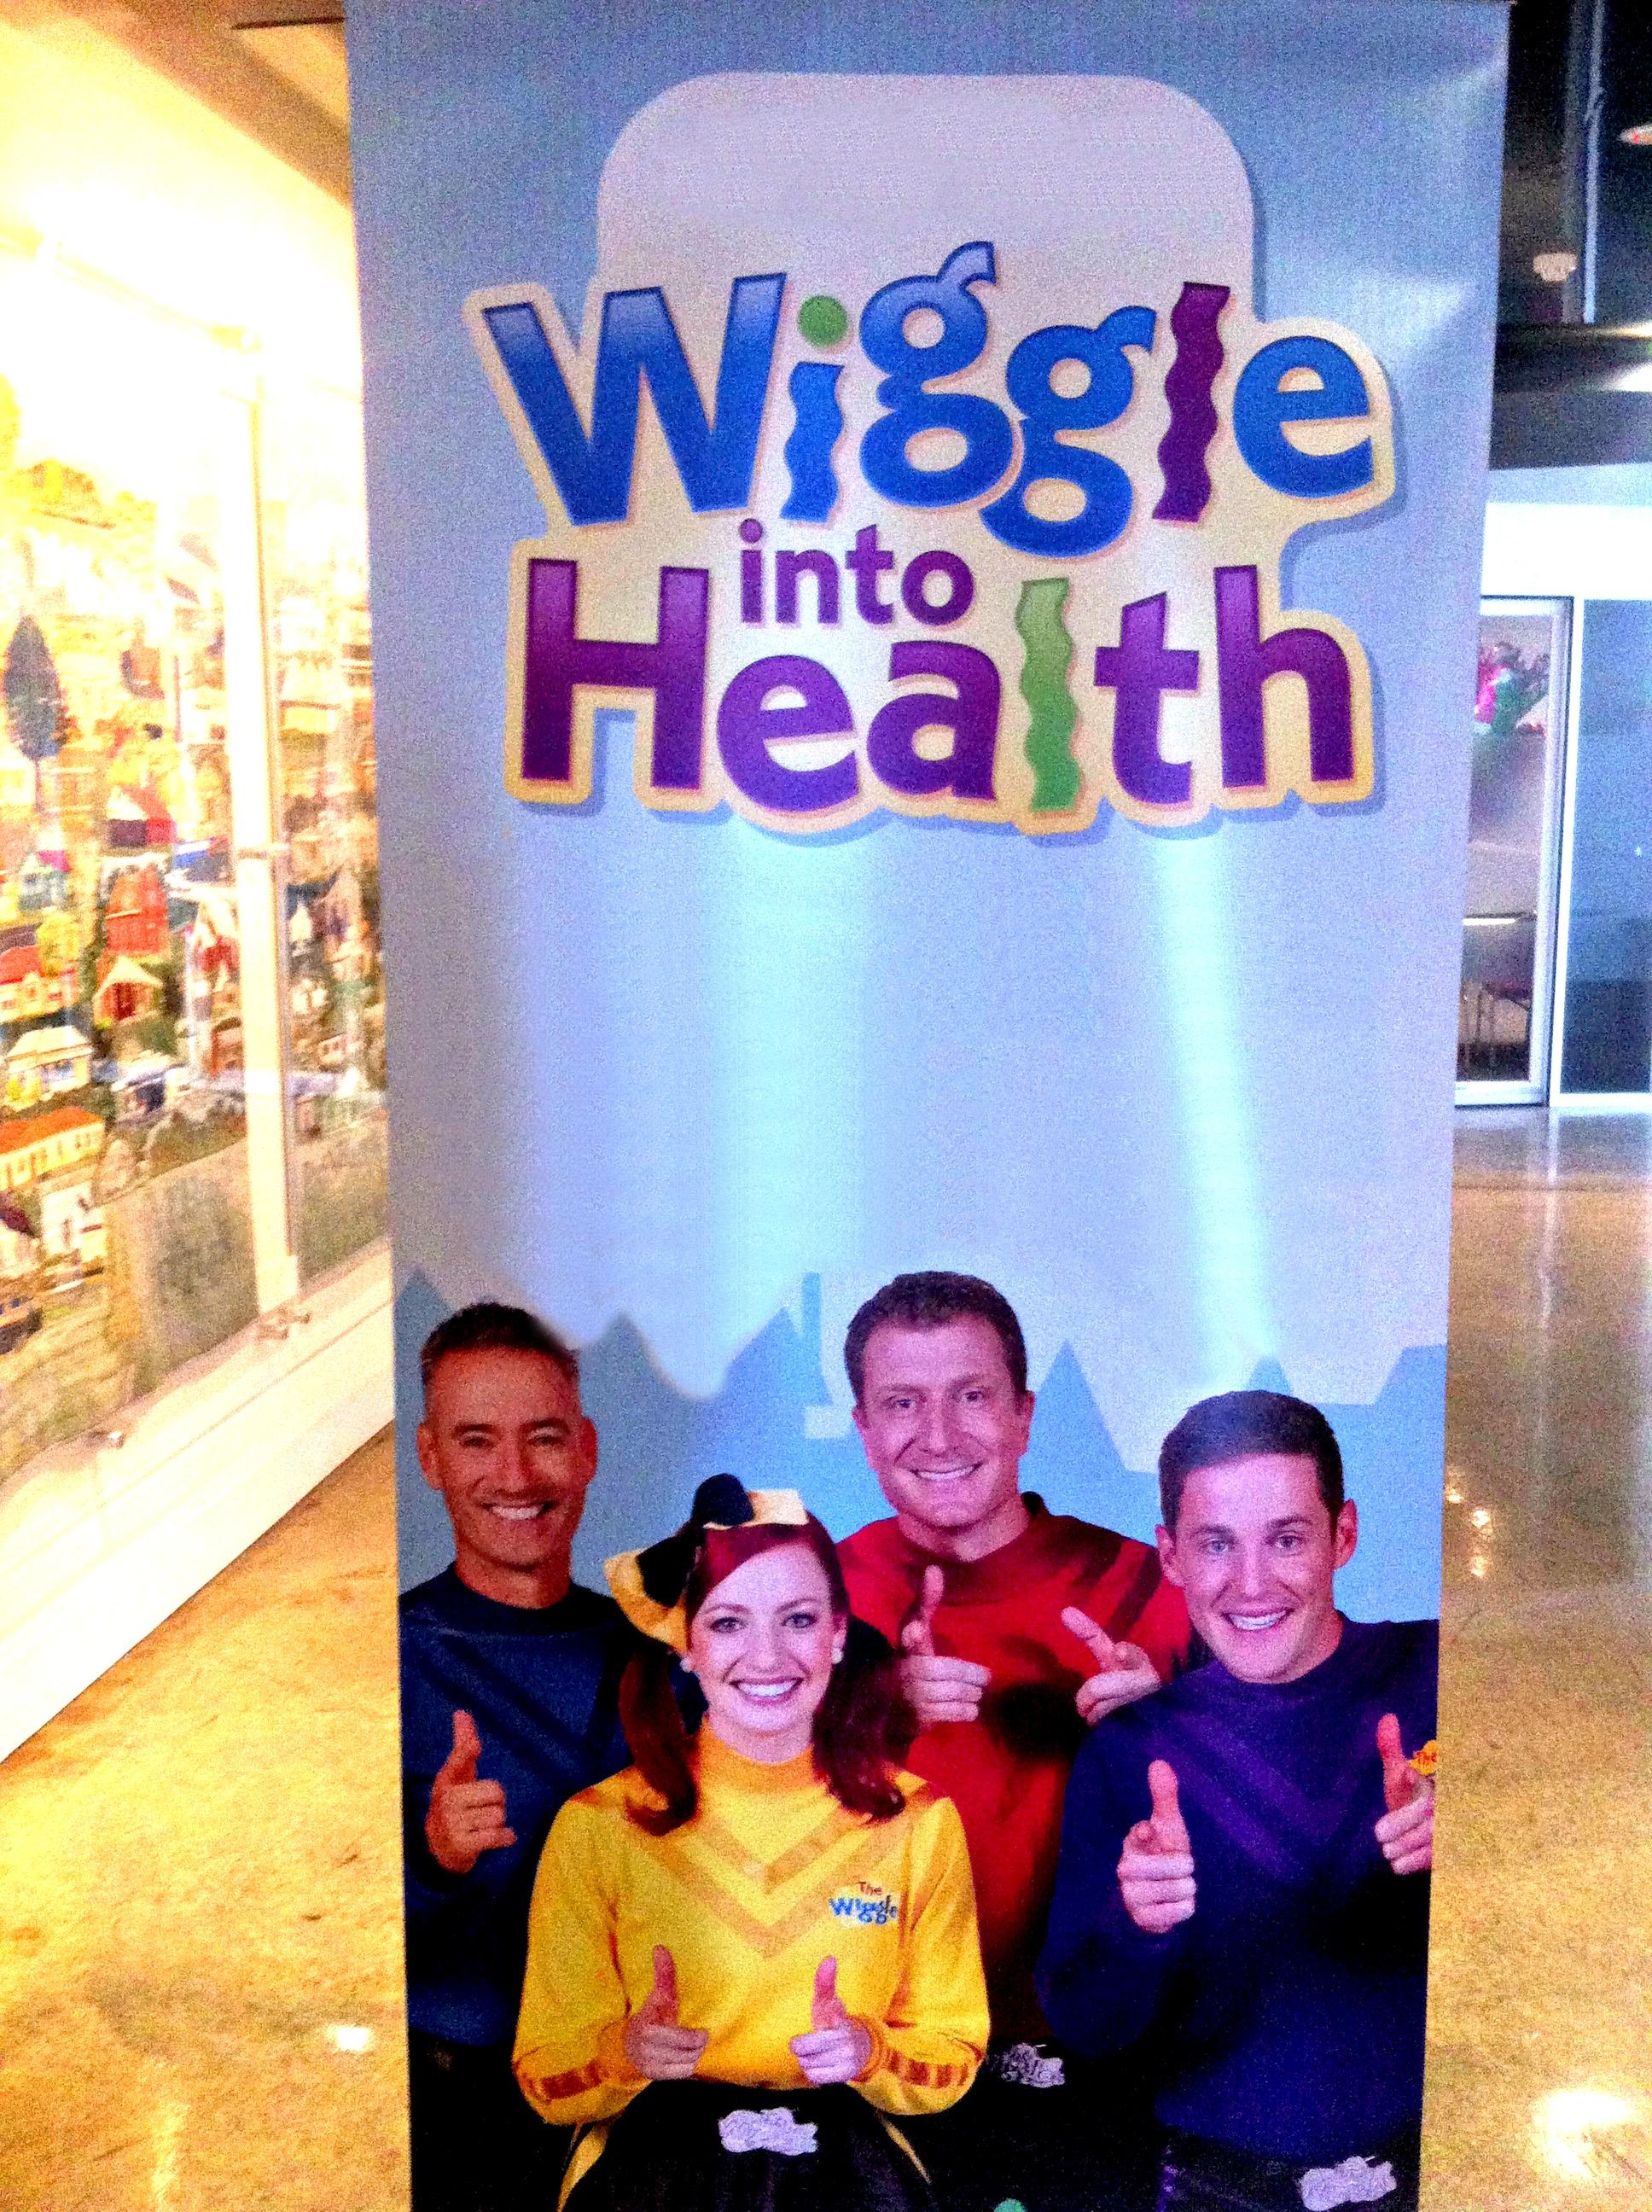 Wiggle into health